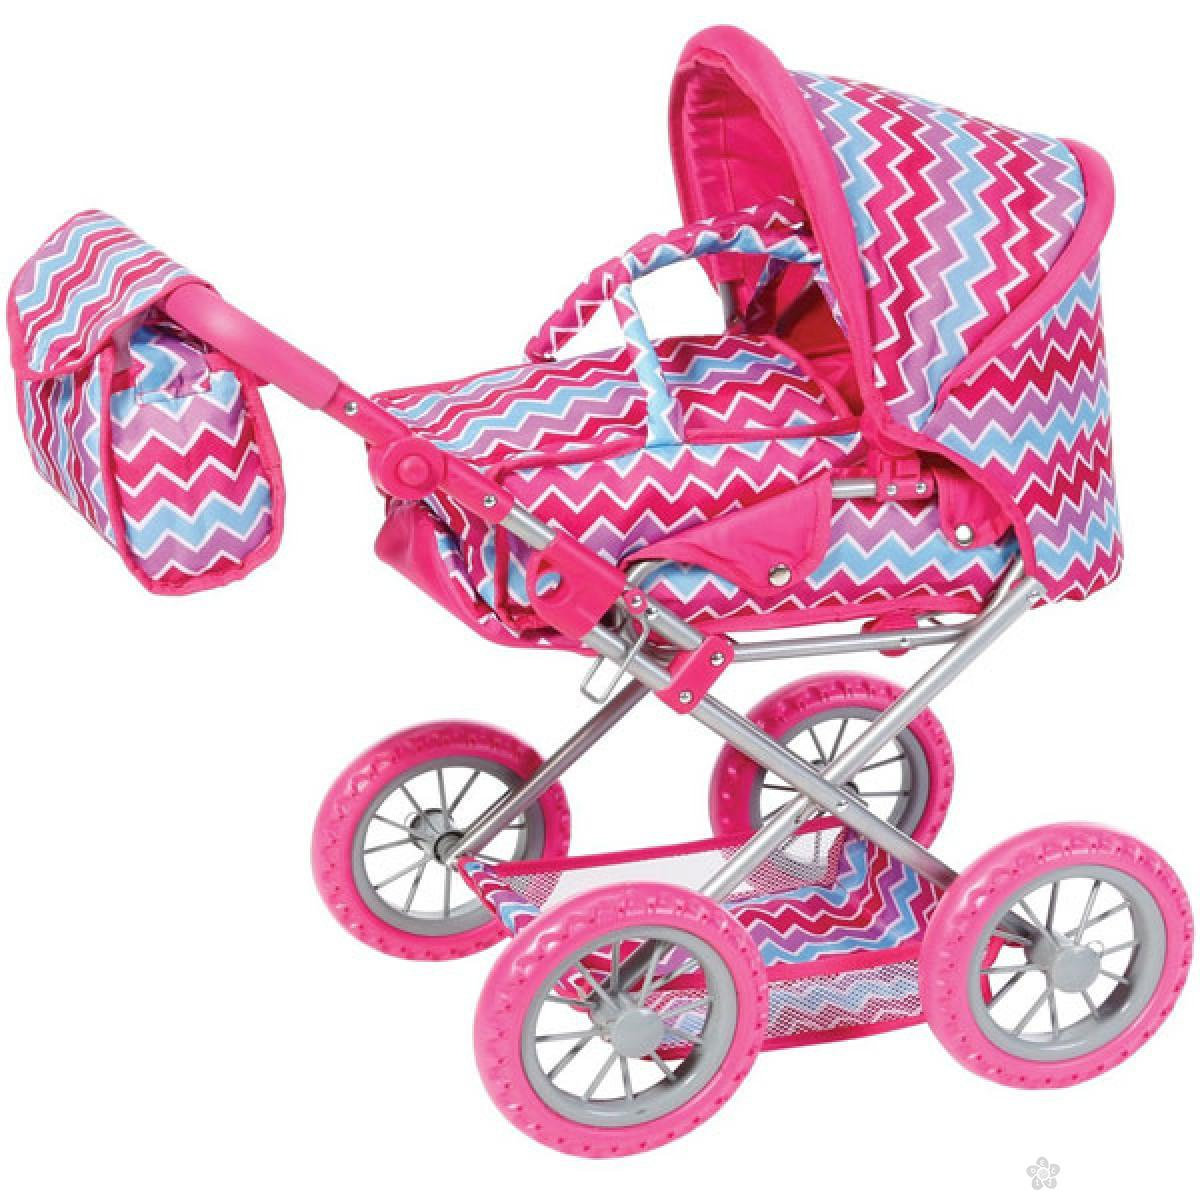 Kolica za lutke Knorr Toys Ruby Pink Zigzag 63196